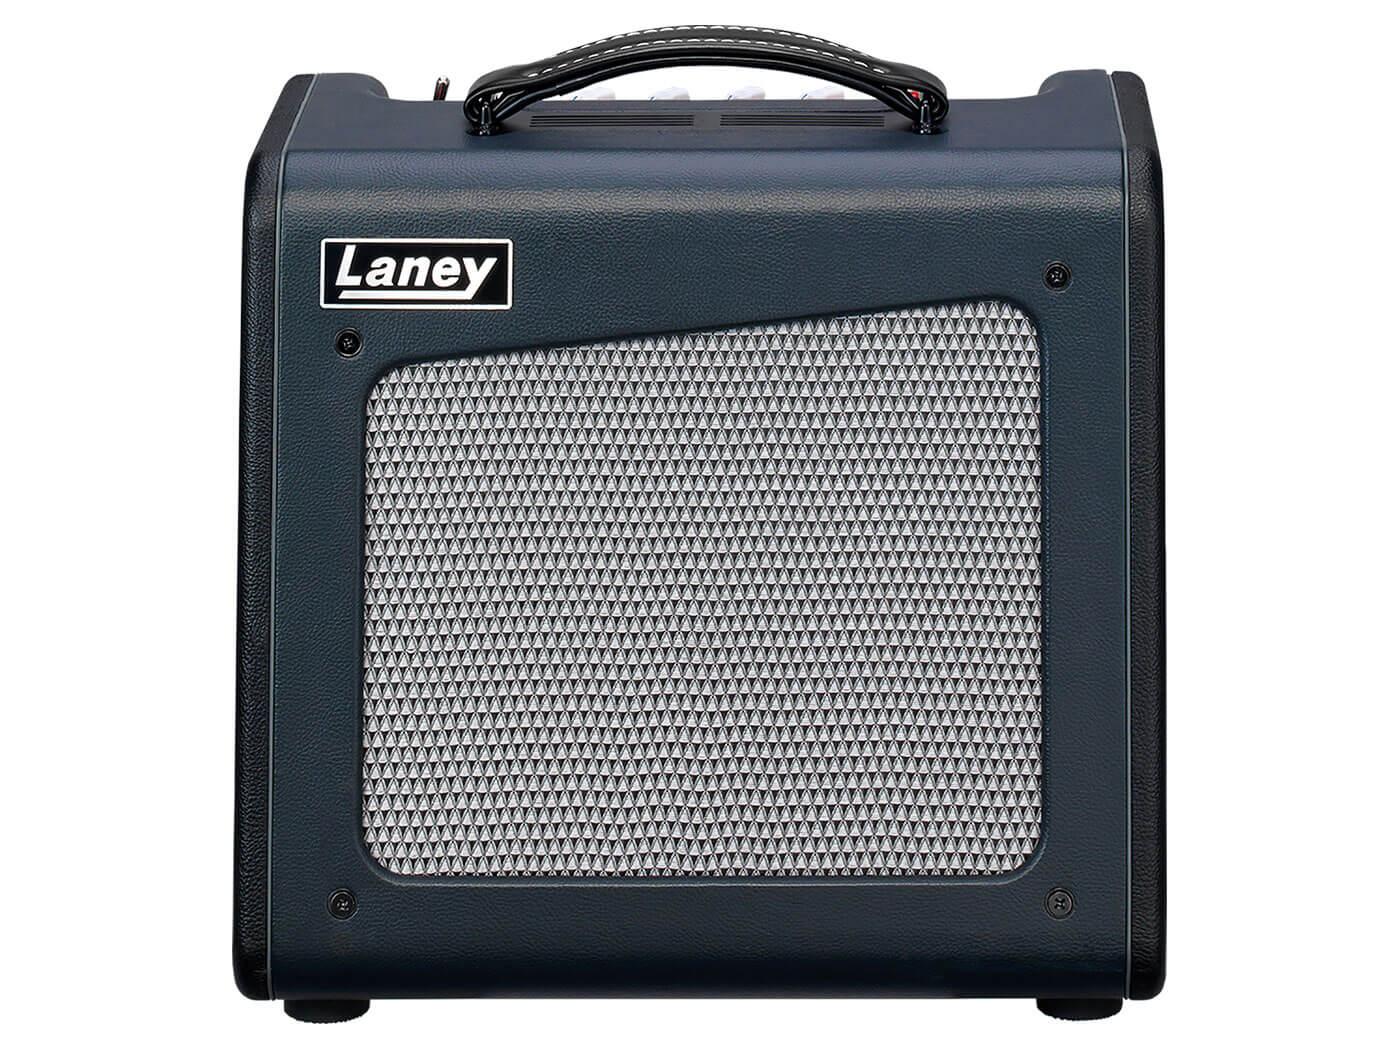 The Laney Cub-Super10